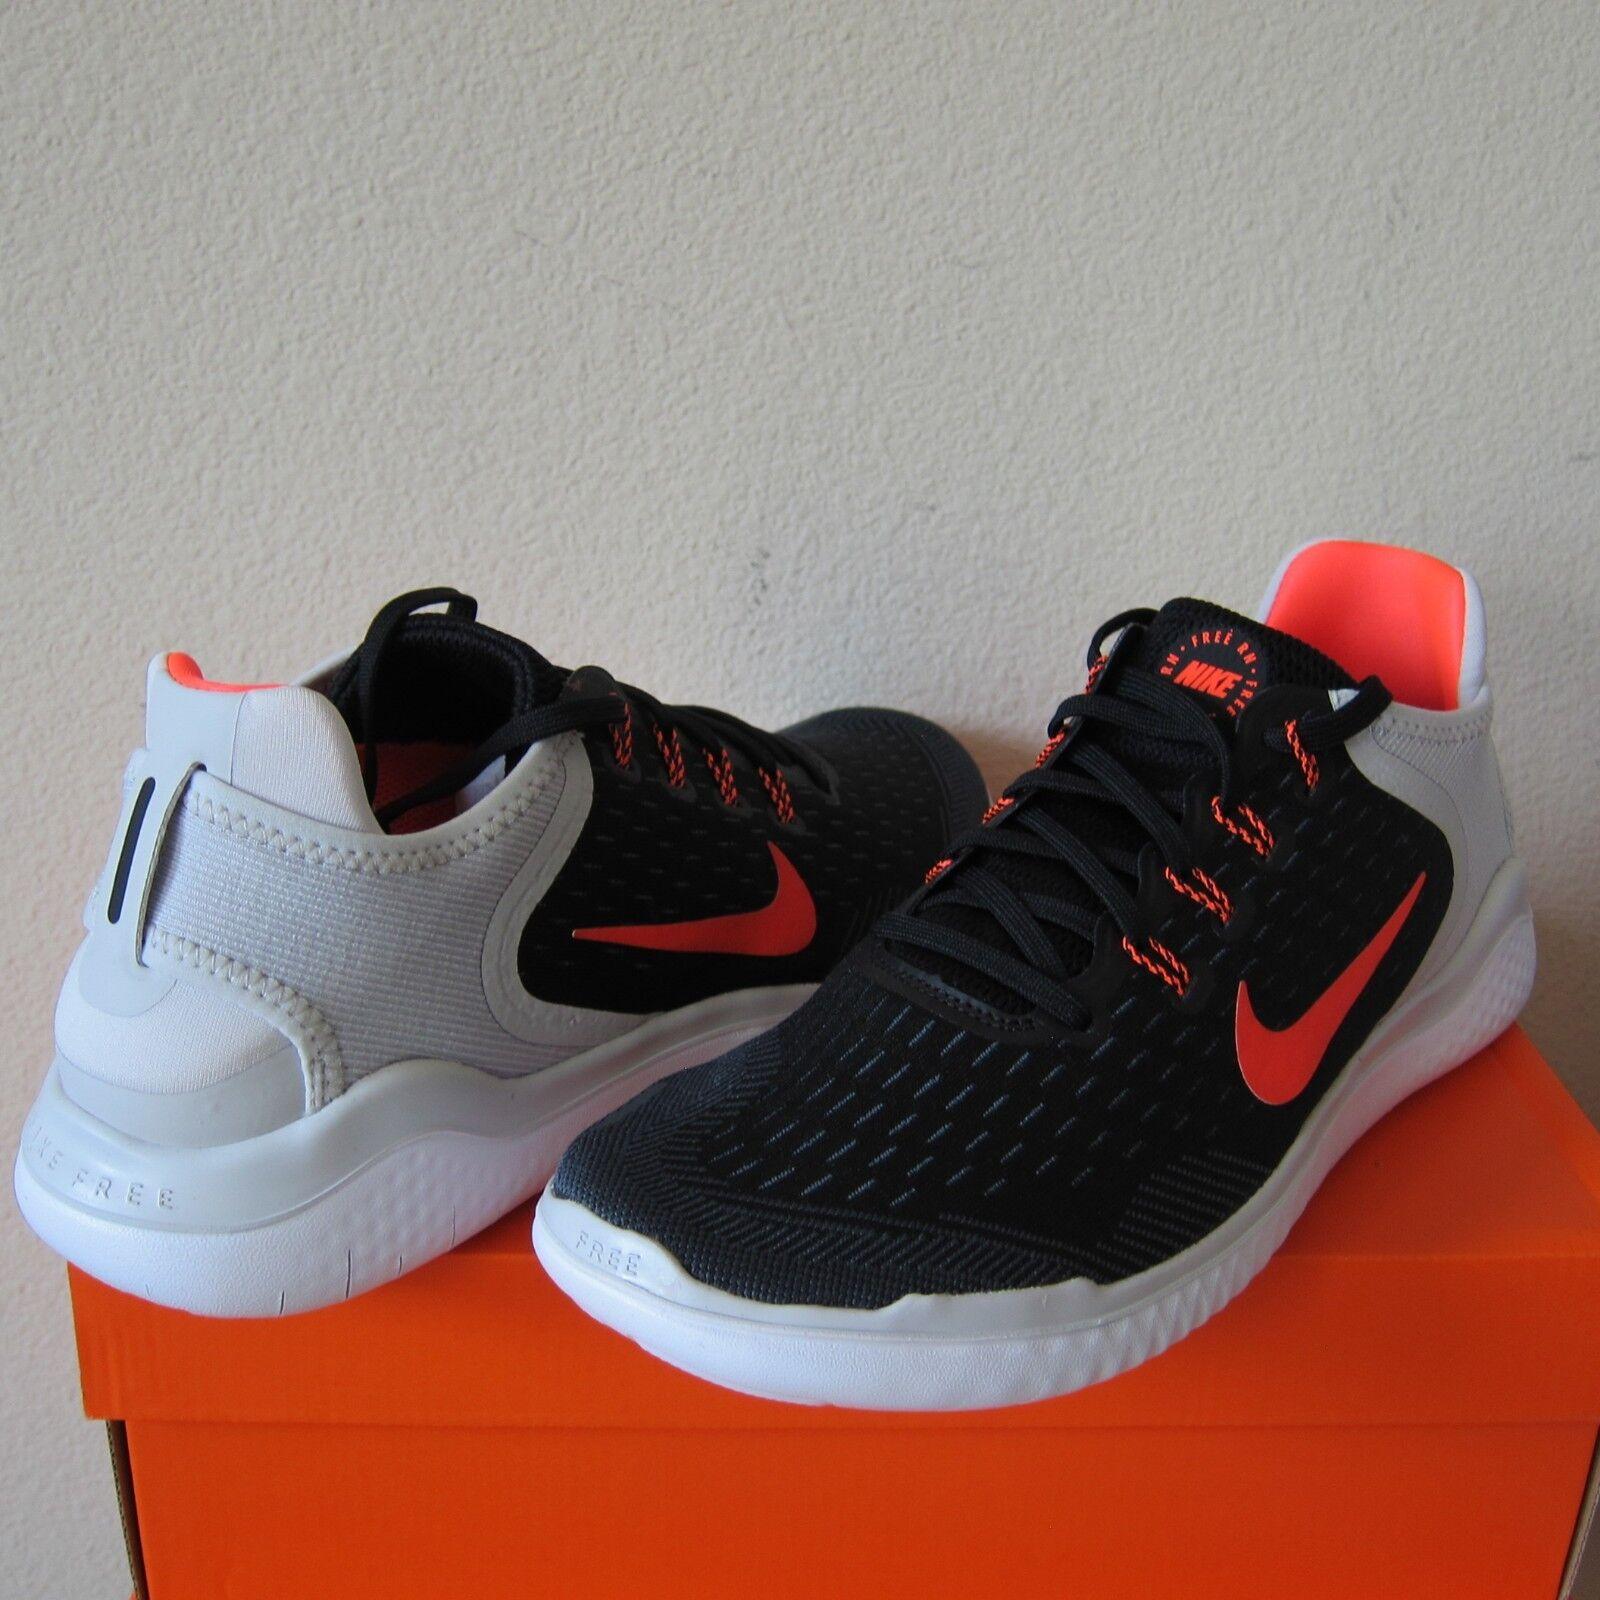 Nike Men's Free RN 2018 Running shoes shoes shoes 1b9650